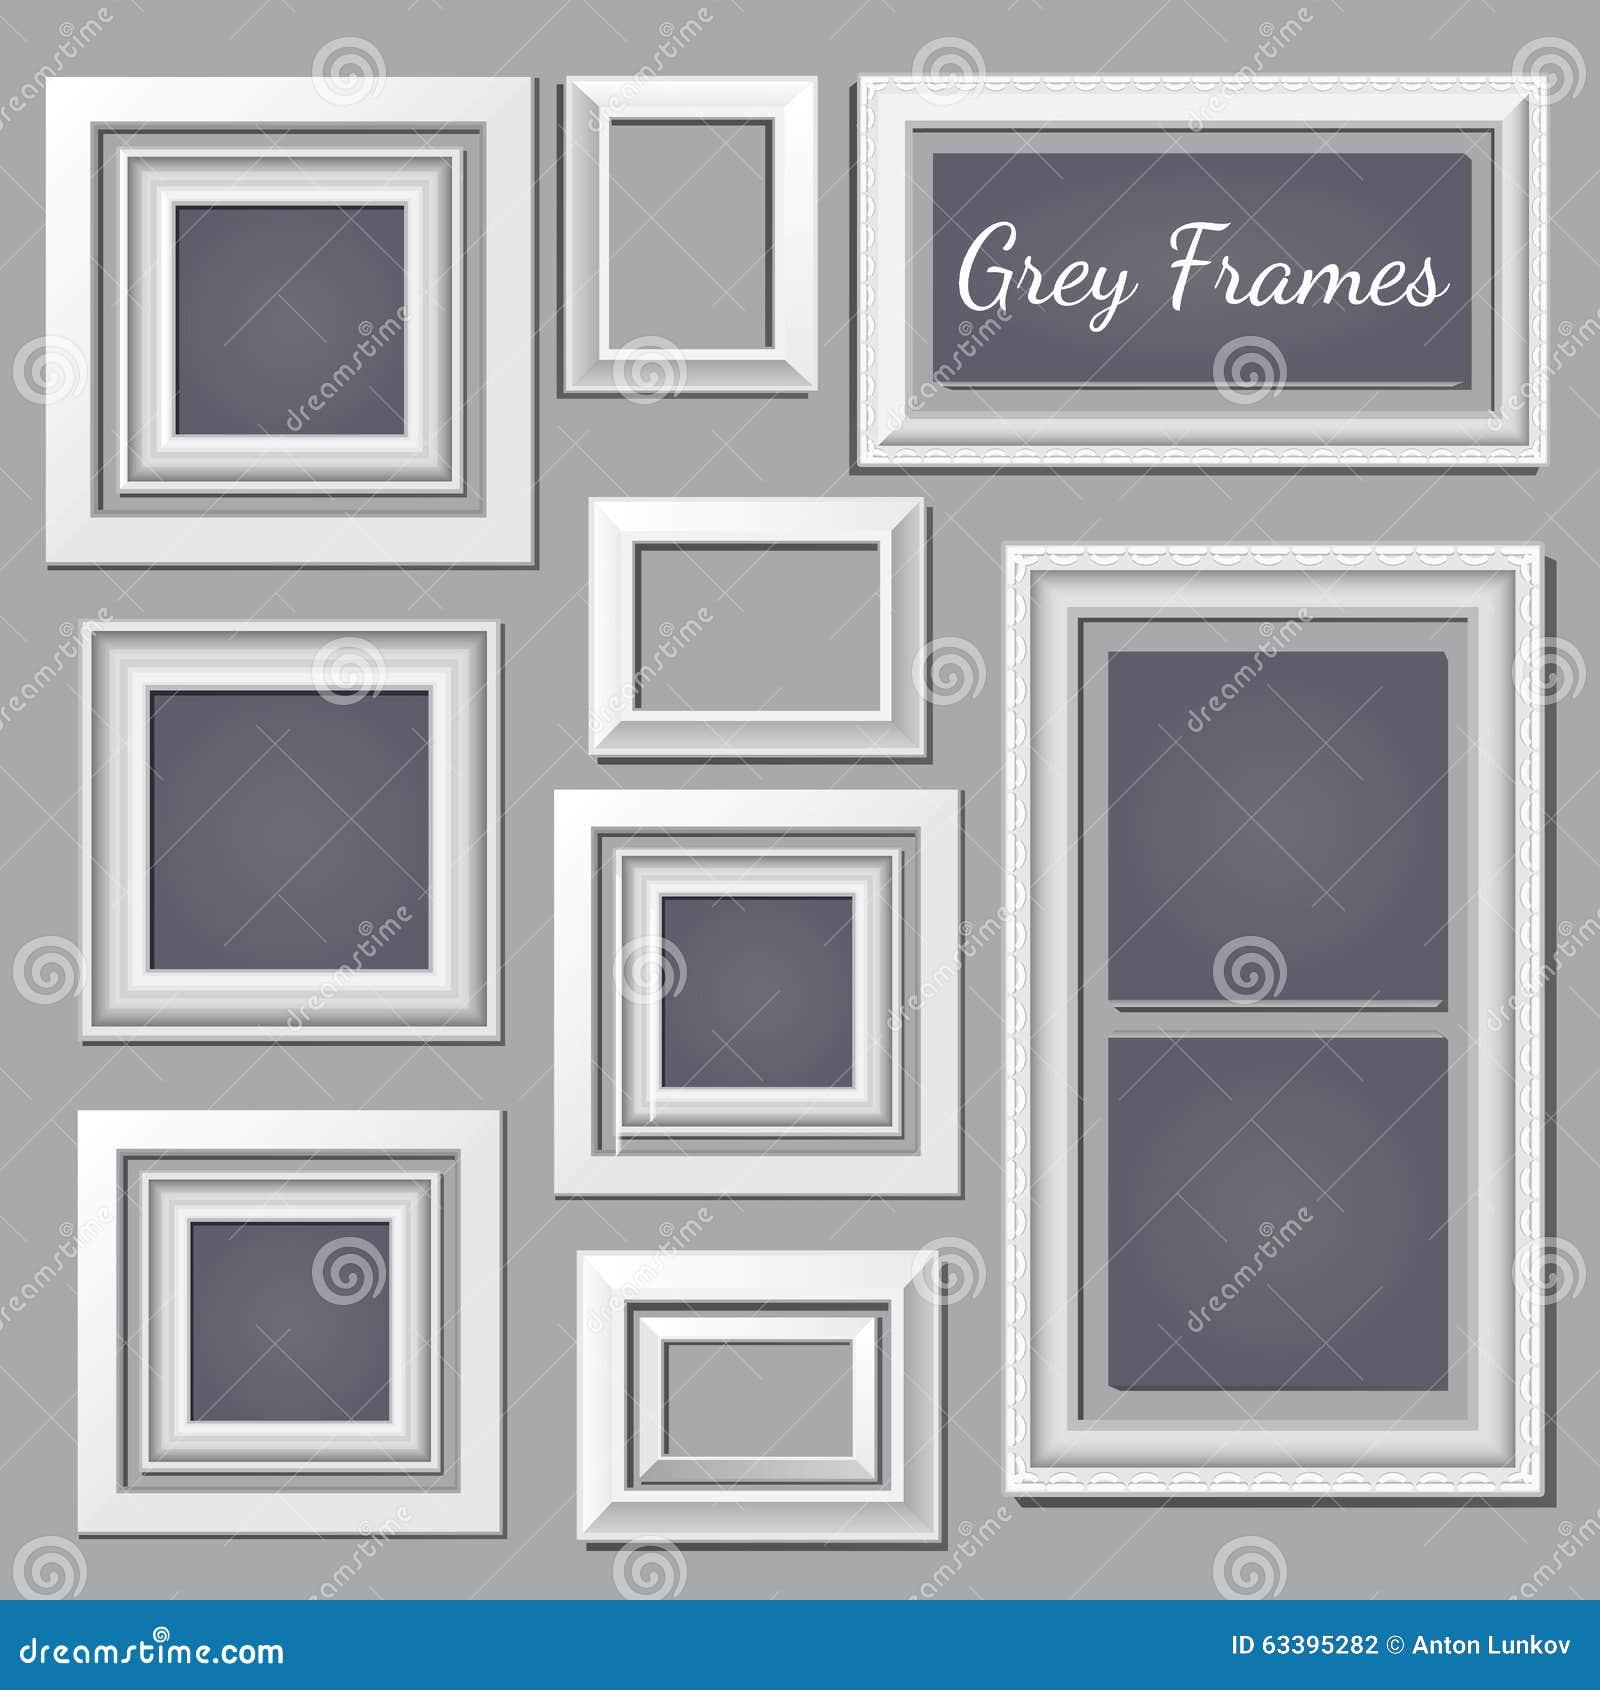 set of white and grey frames for your design needs stock. Black Bedroom Furniture Sets. Home Design Ideas